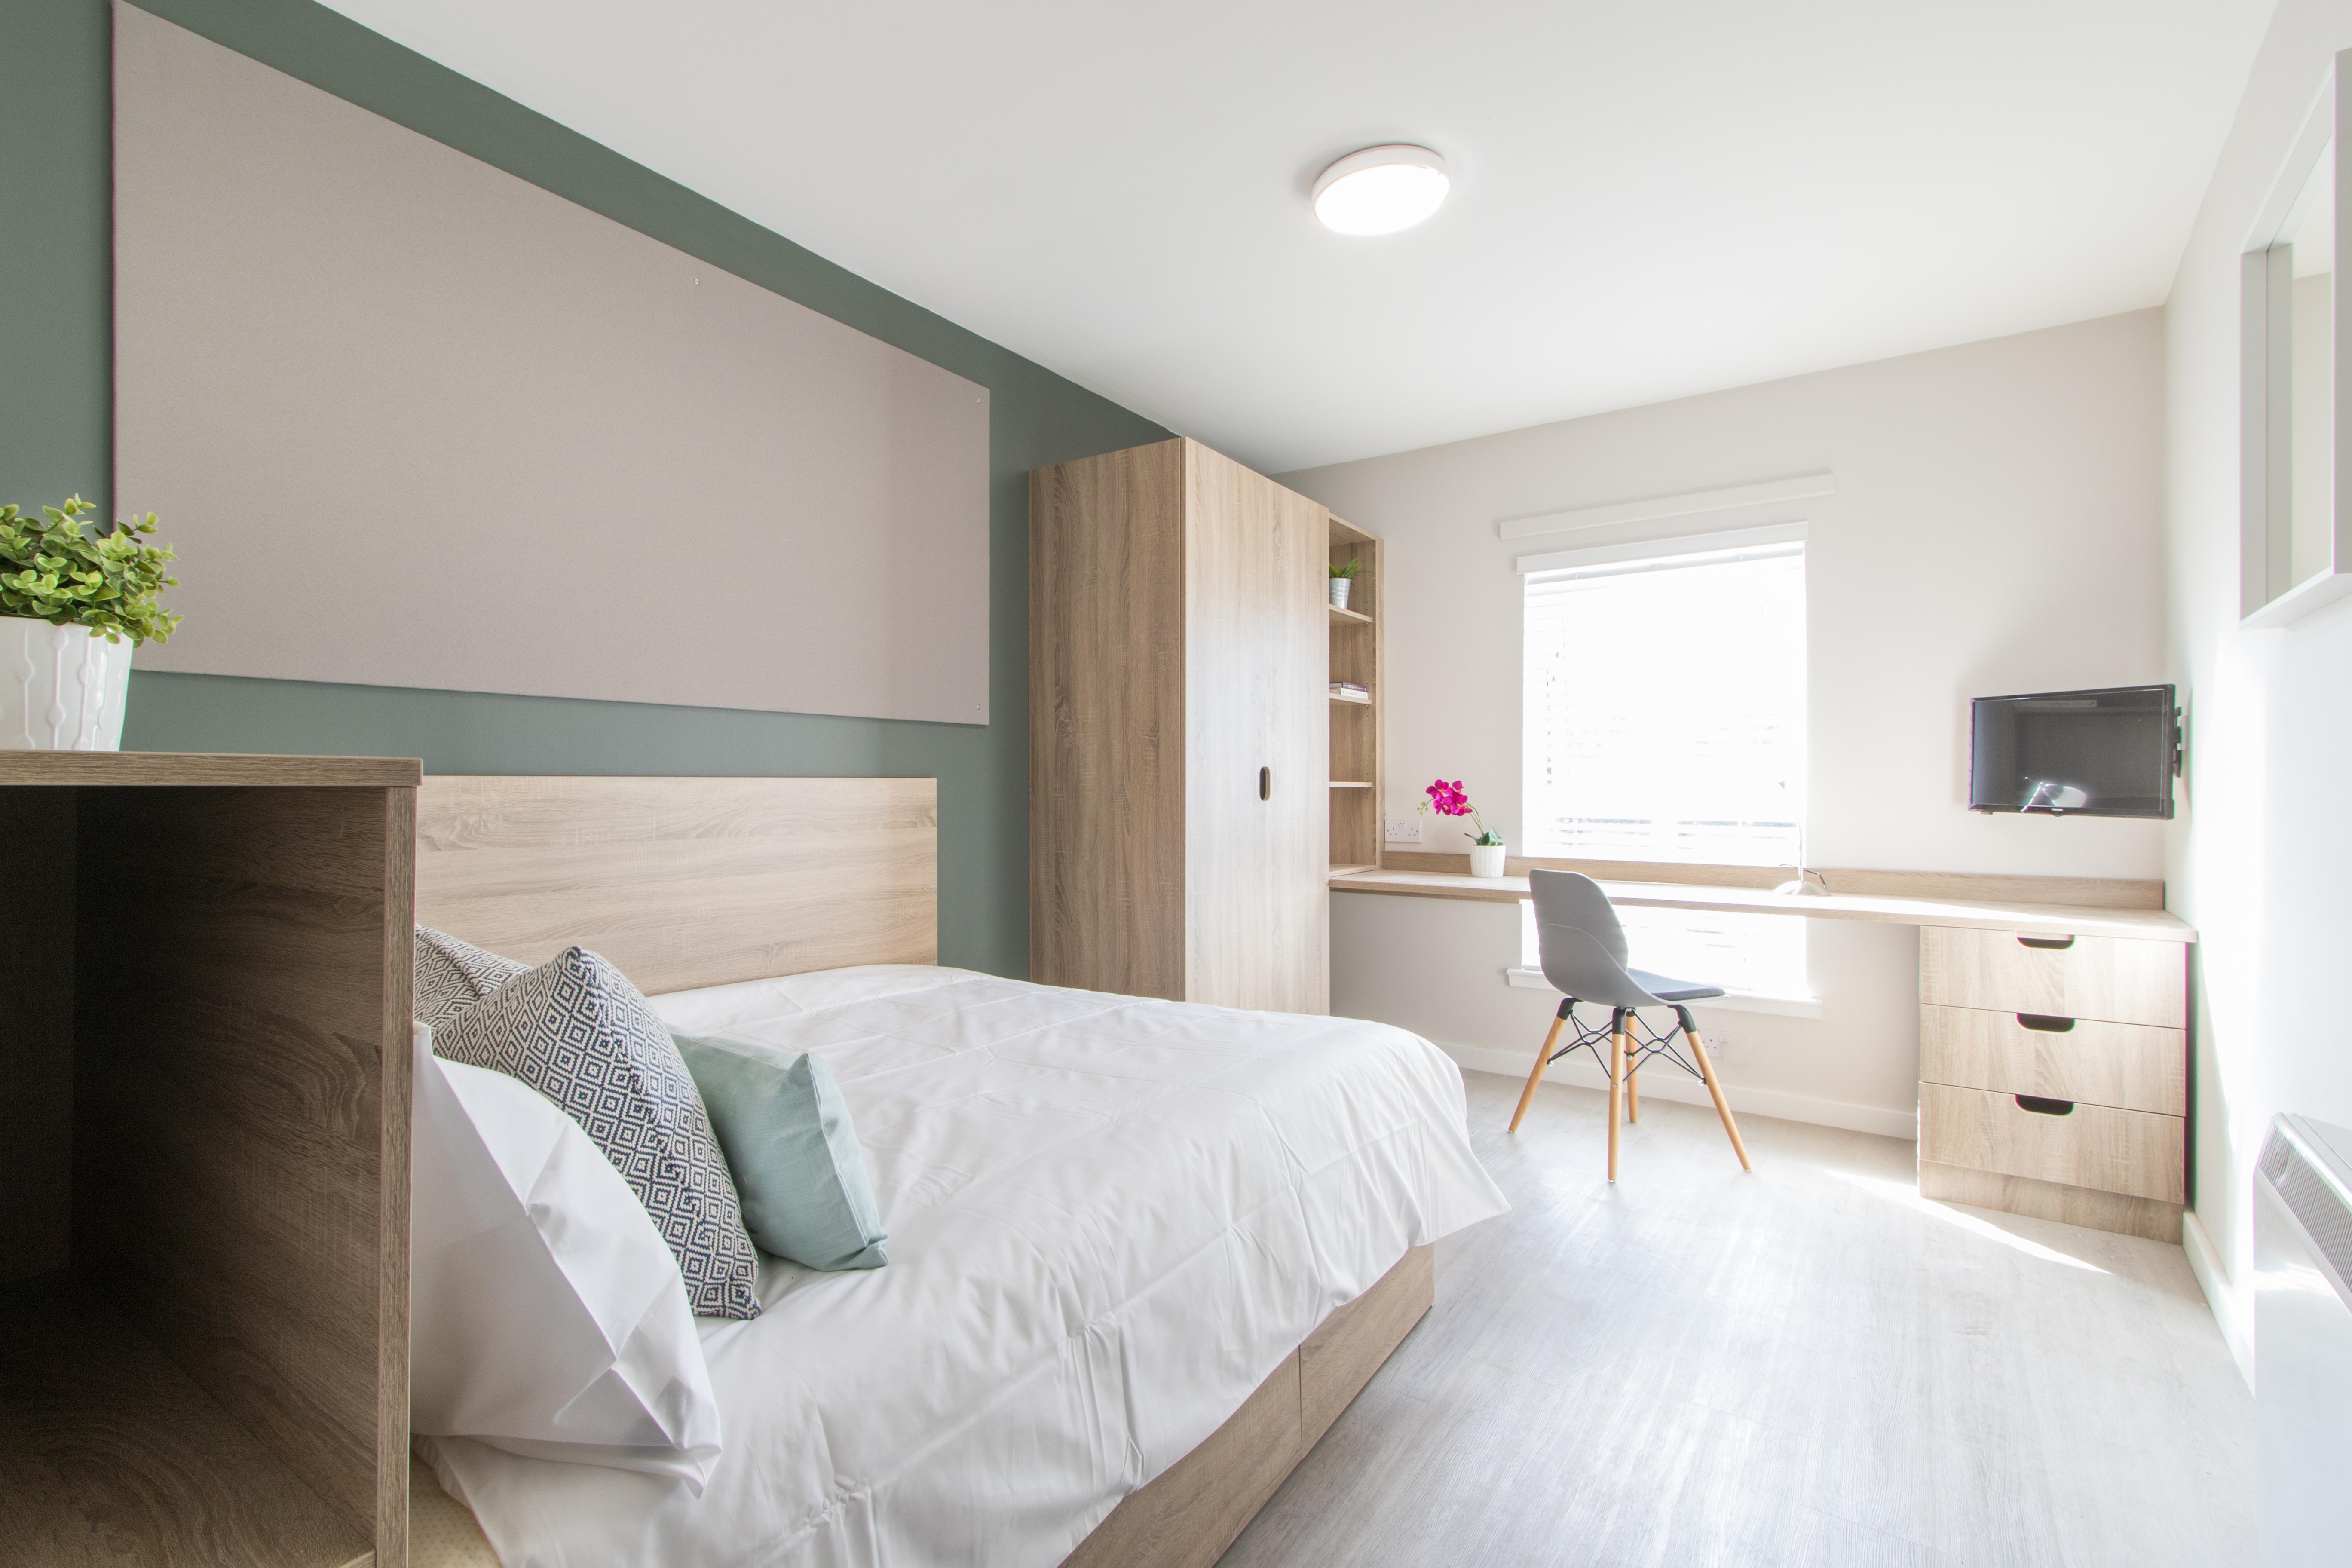 Flat 11, 6 Morrison Circus 4 Bedroom Student Flat ...